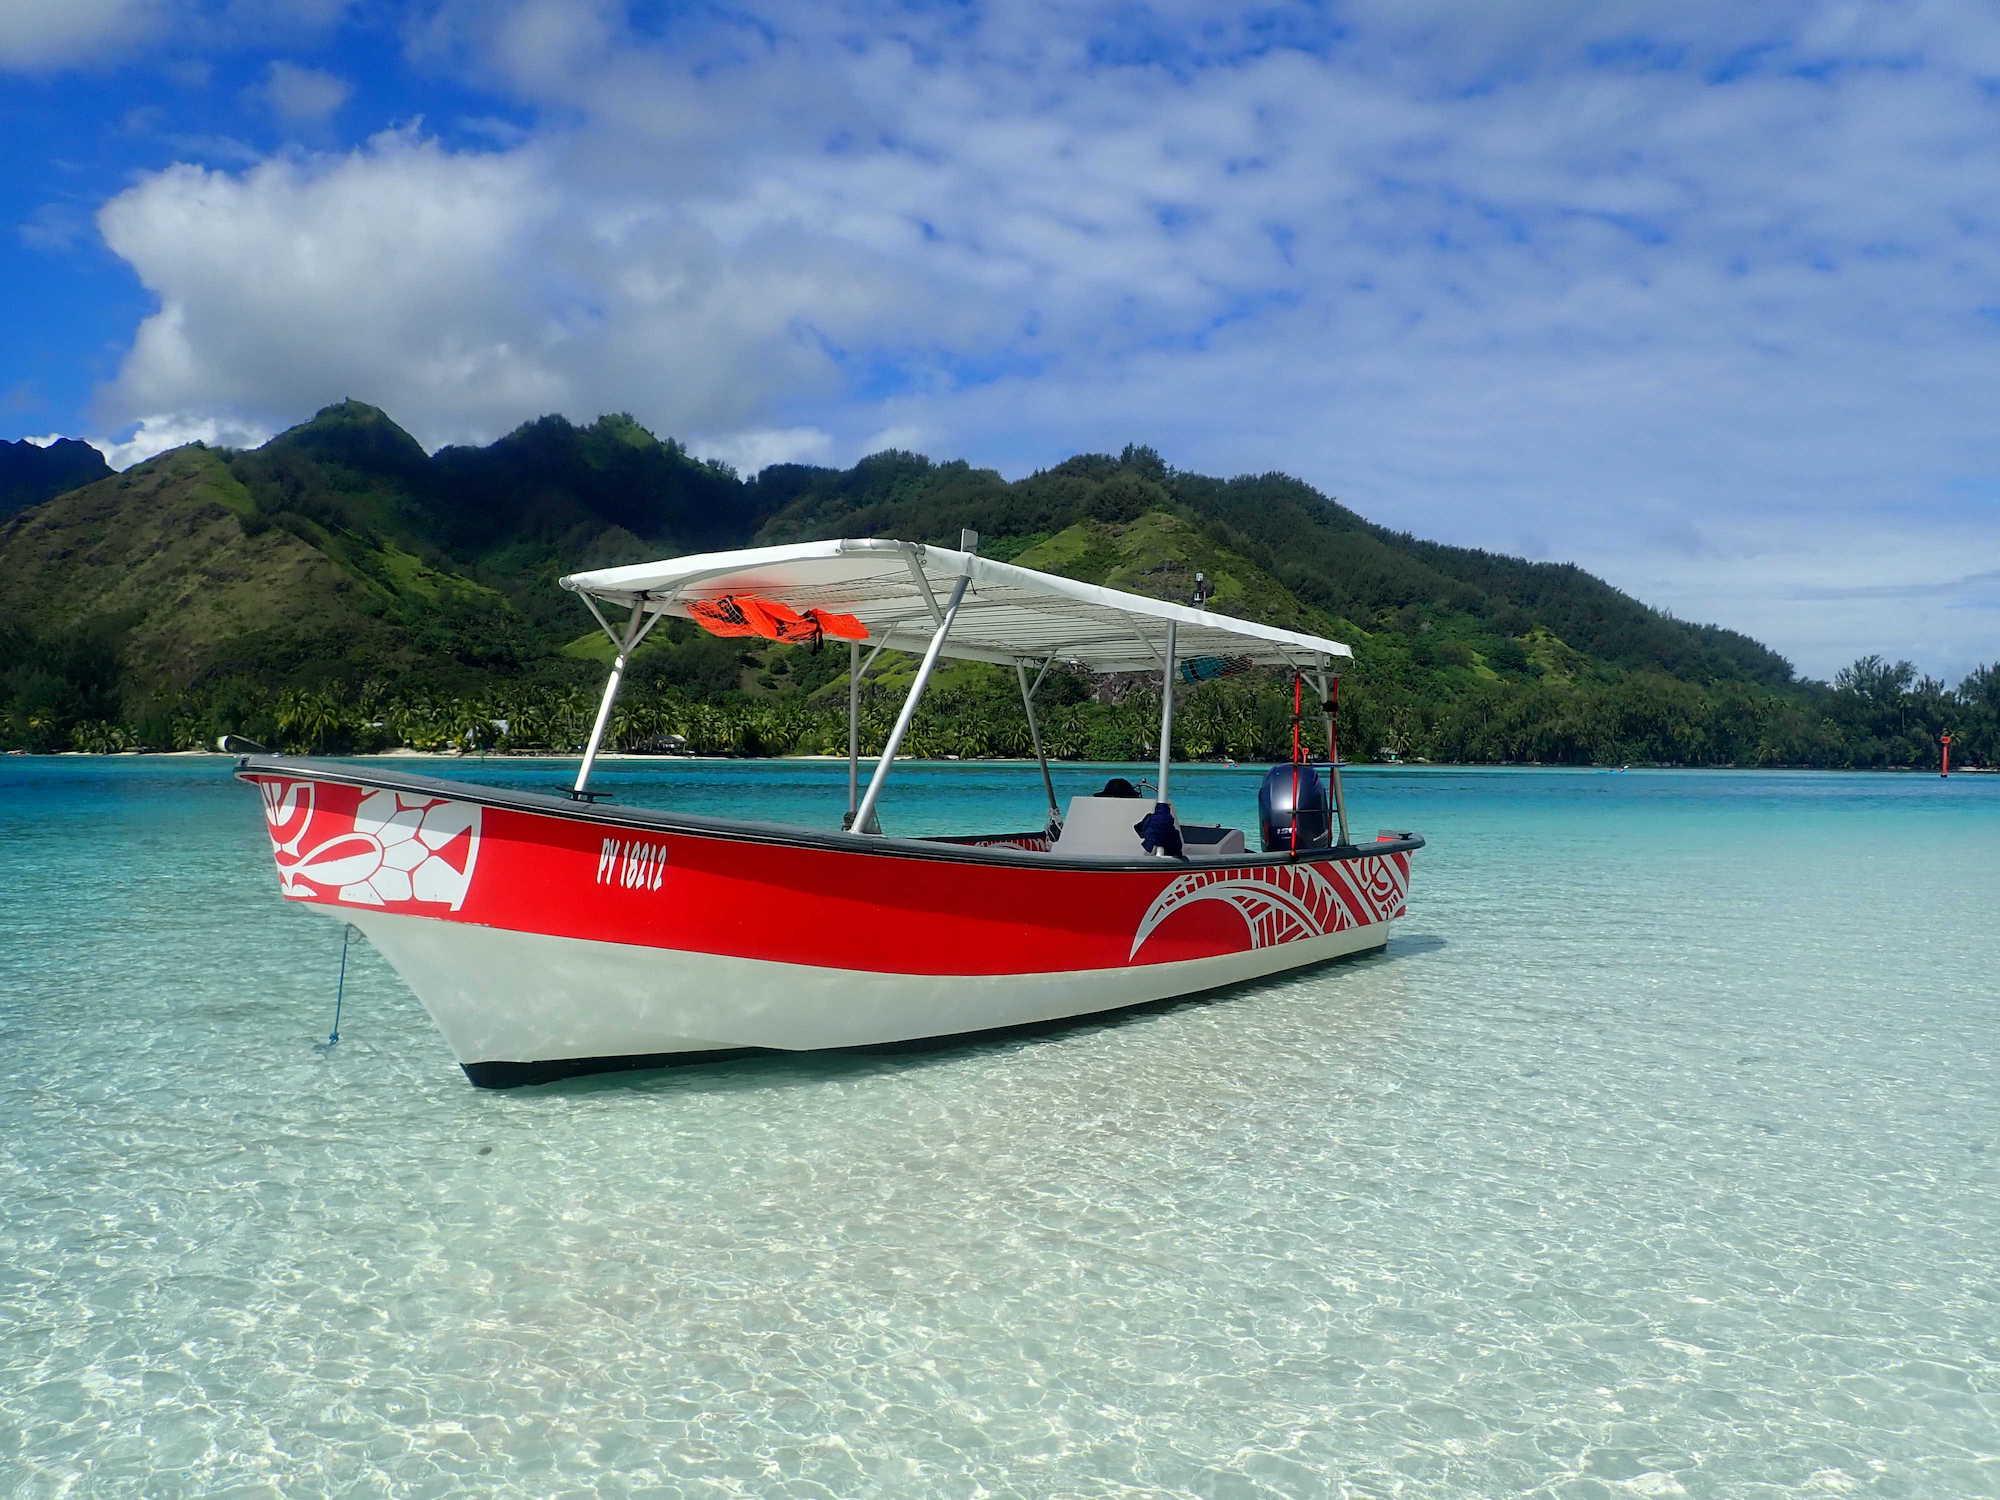 https://tahititourisme.com/wp-content/uploads/2020/09/Boat-Hinaloa.jpg